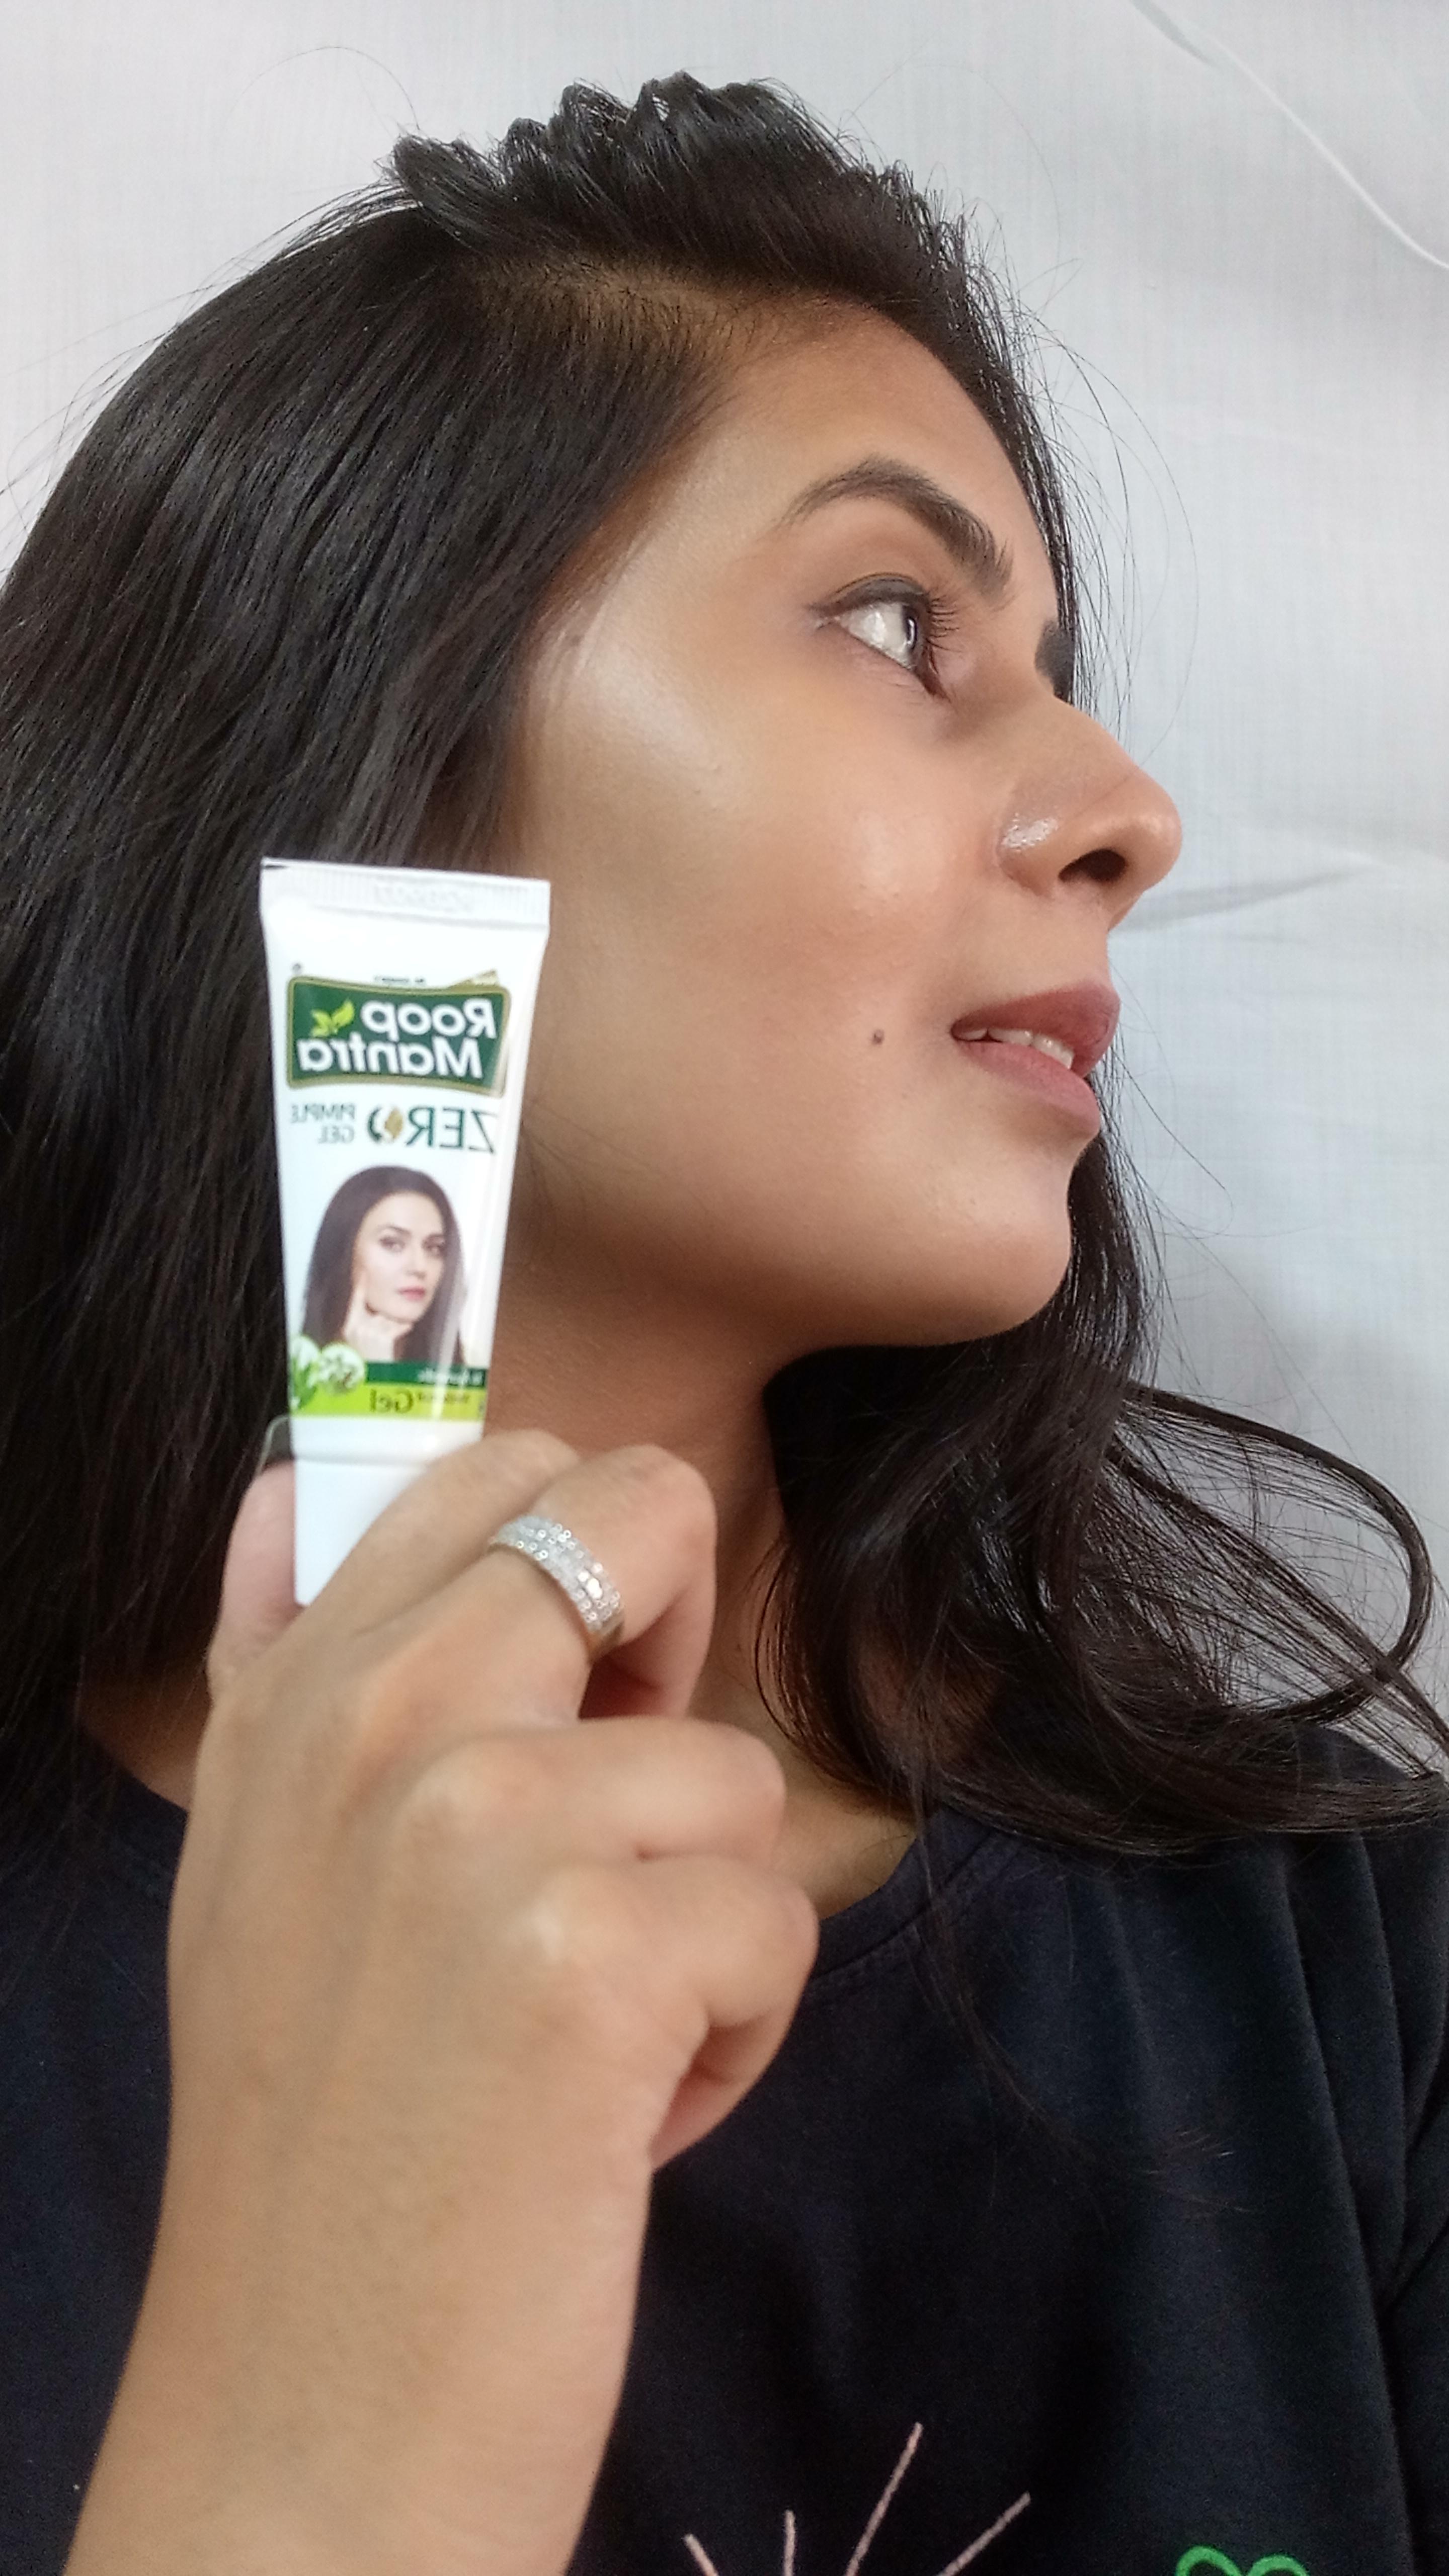 Roop Mantra Zero Pimple Gel-Works quite fine-By purvidhaniwala